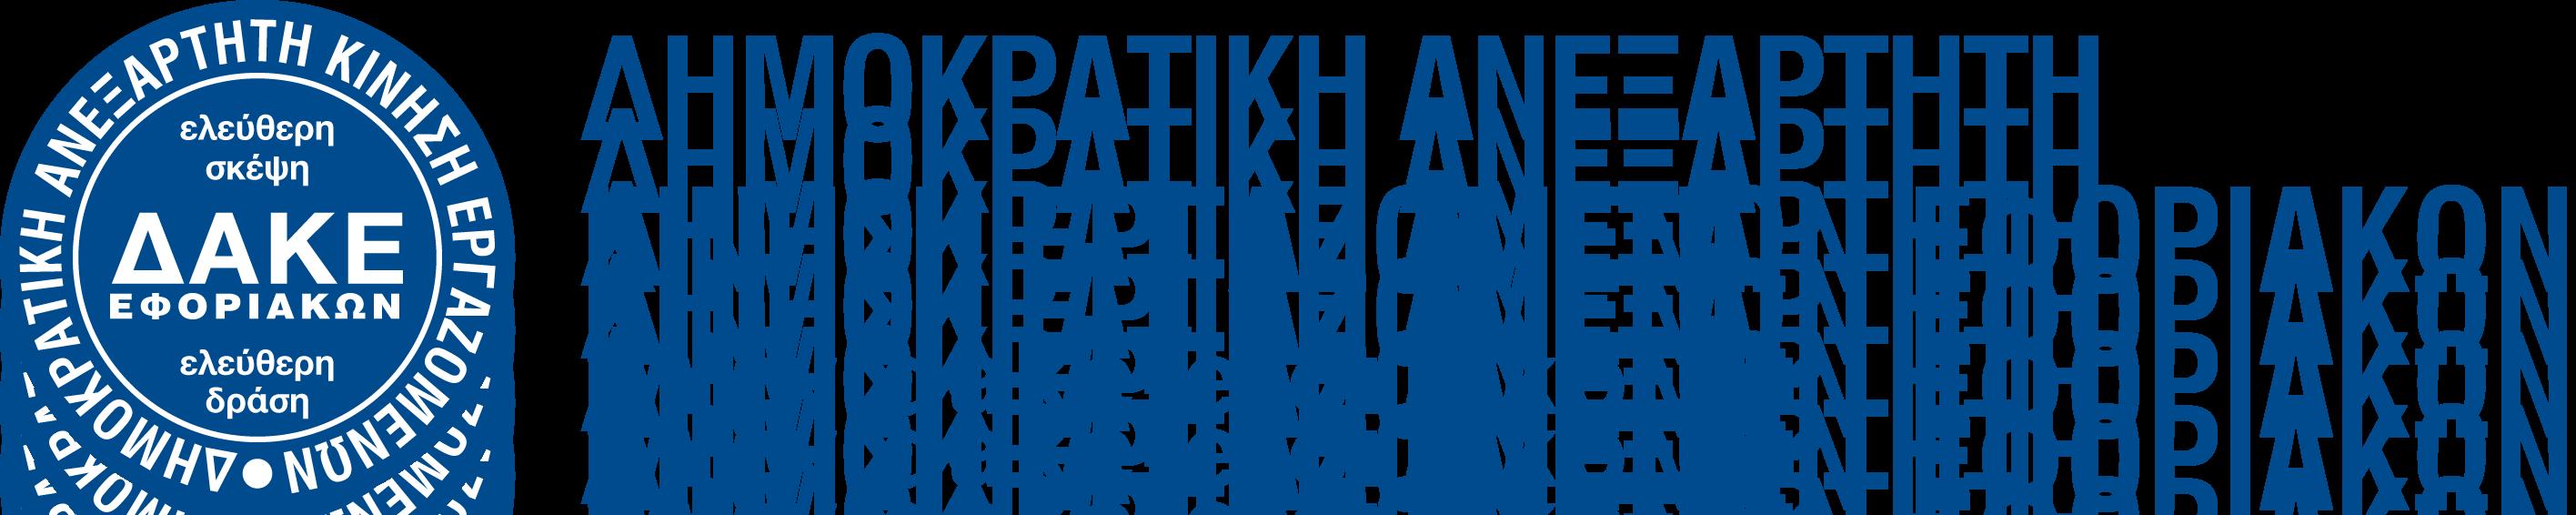 dake eforiakwn